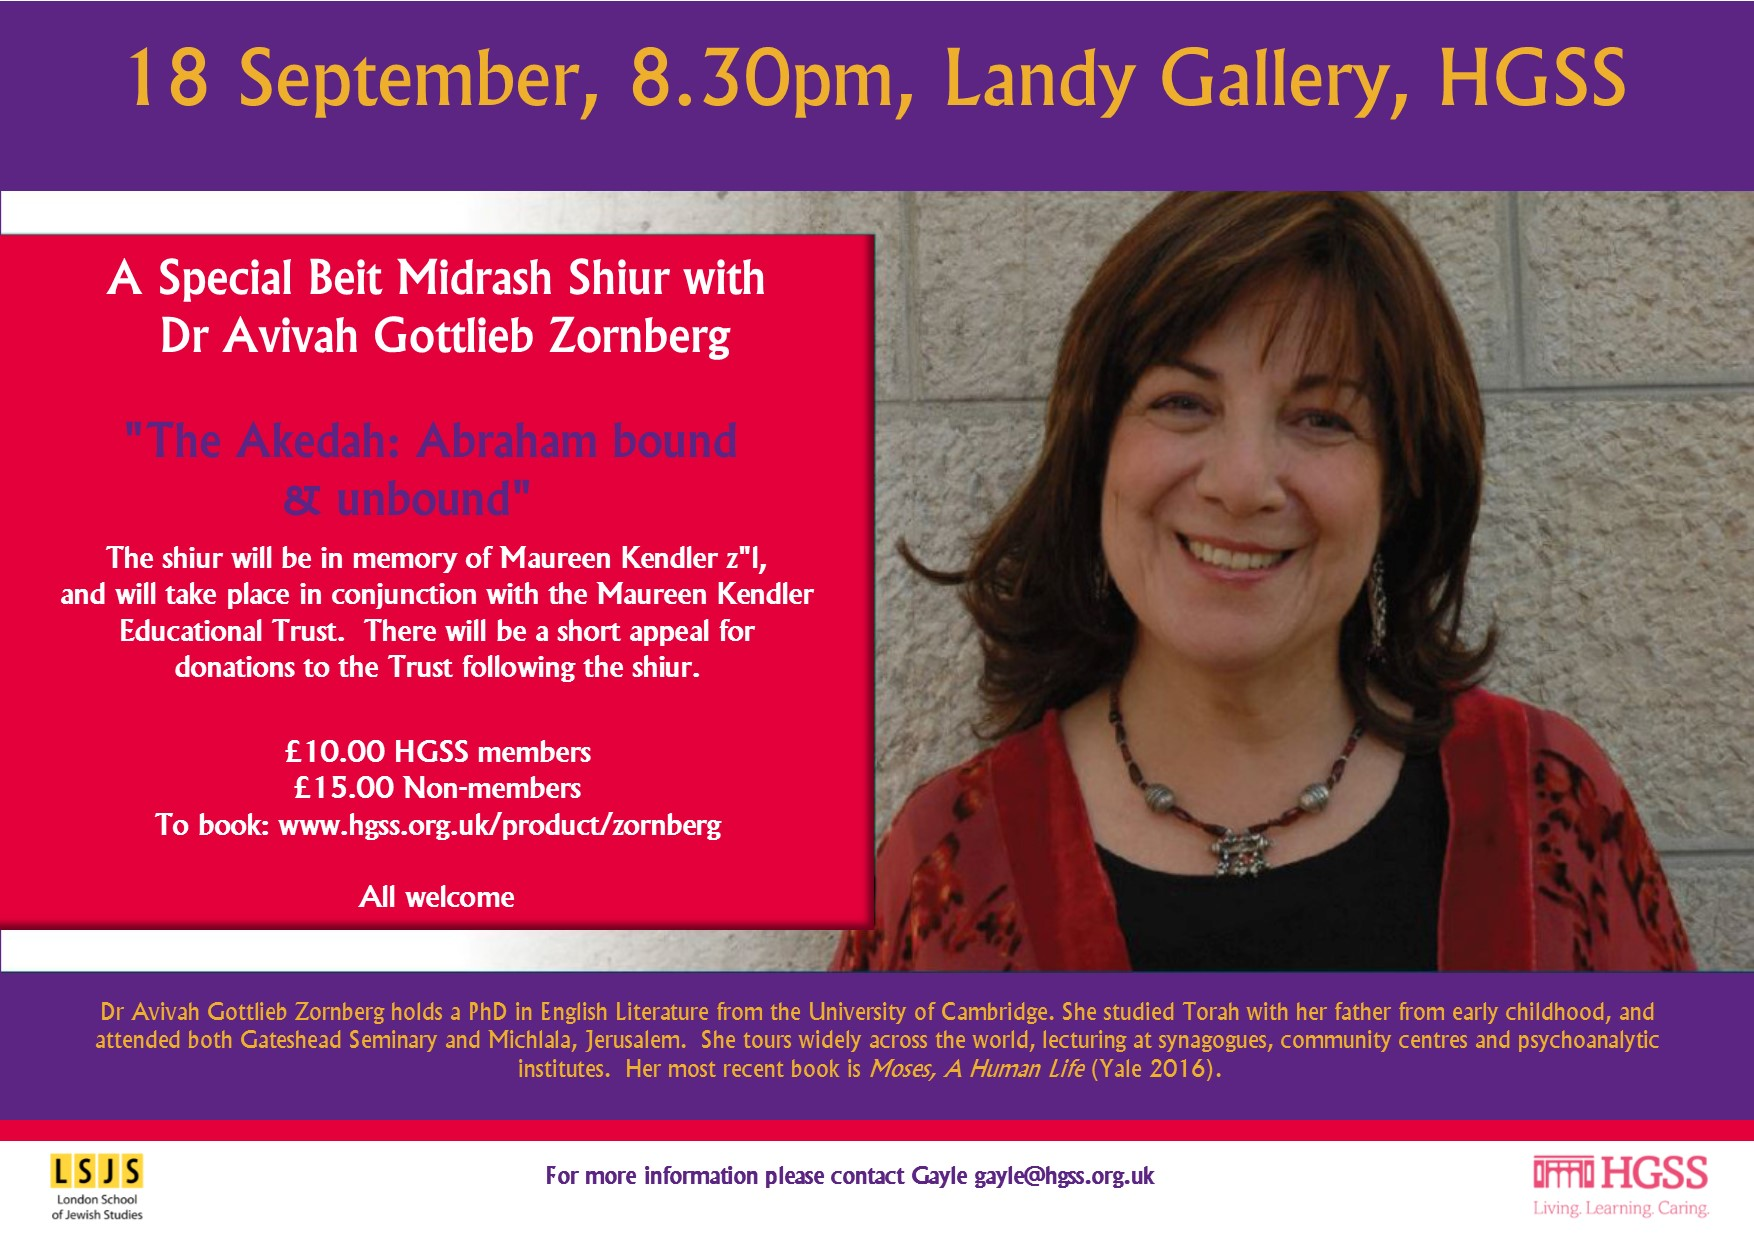 Special Beit Midrash Programme @ Landy Gallery